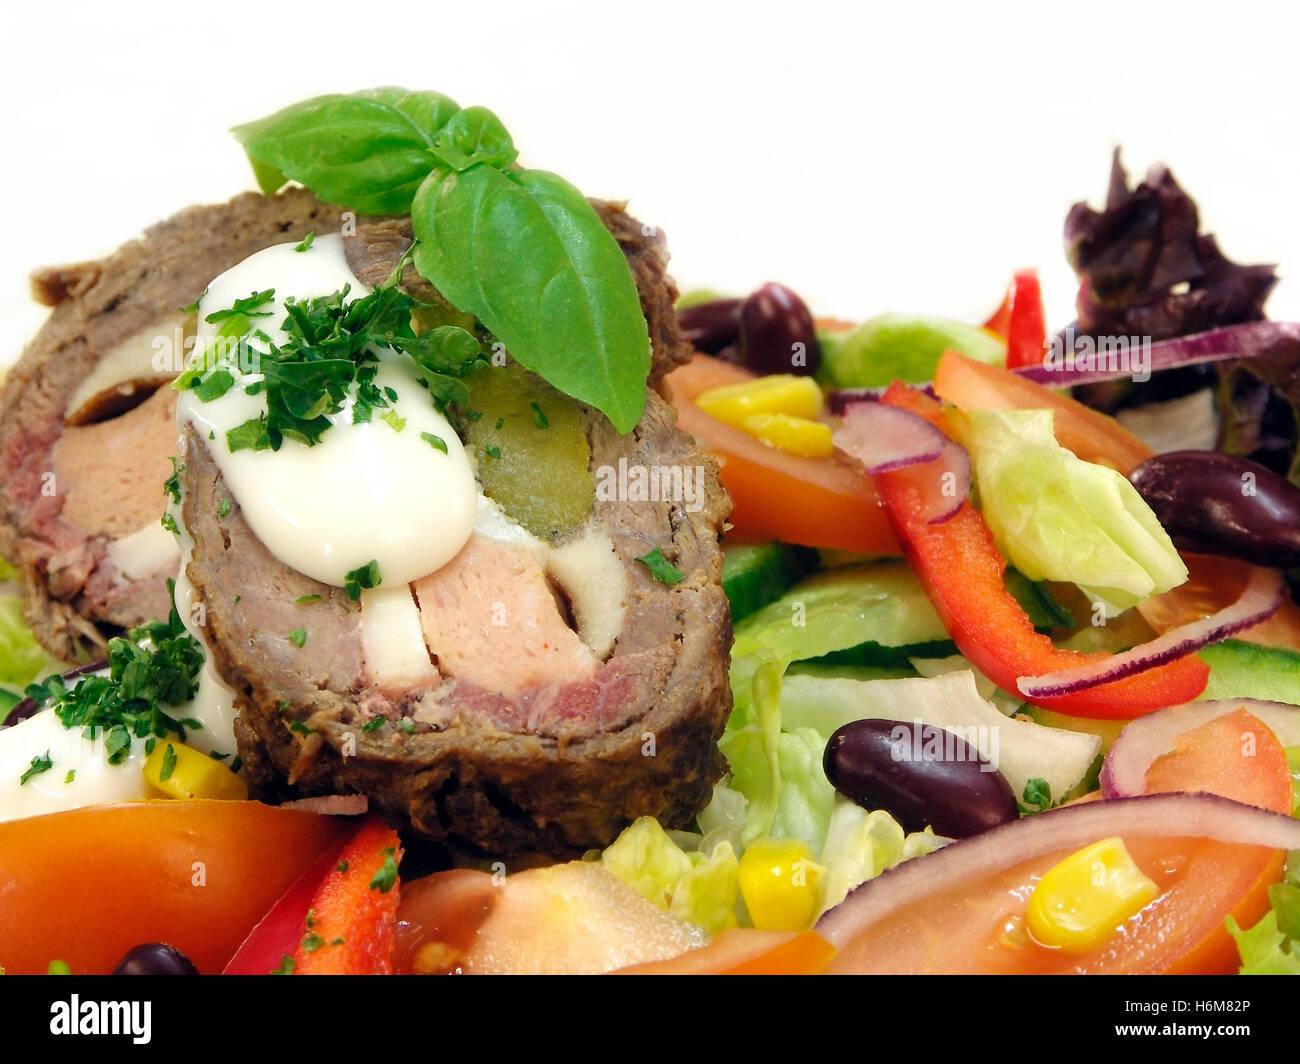 european food - Stock Image